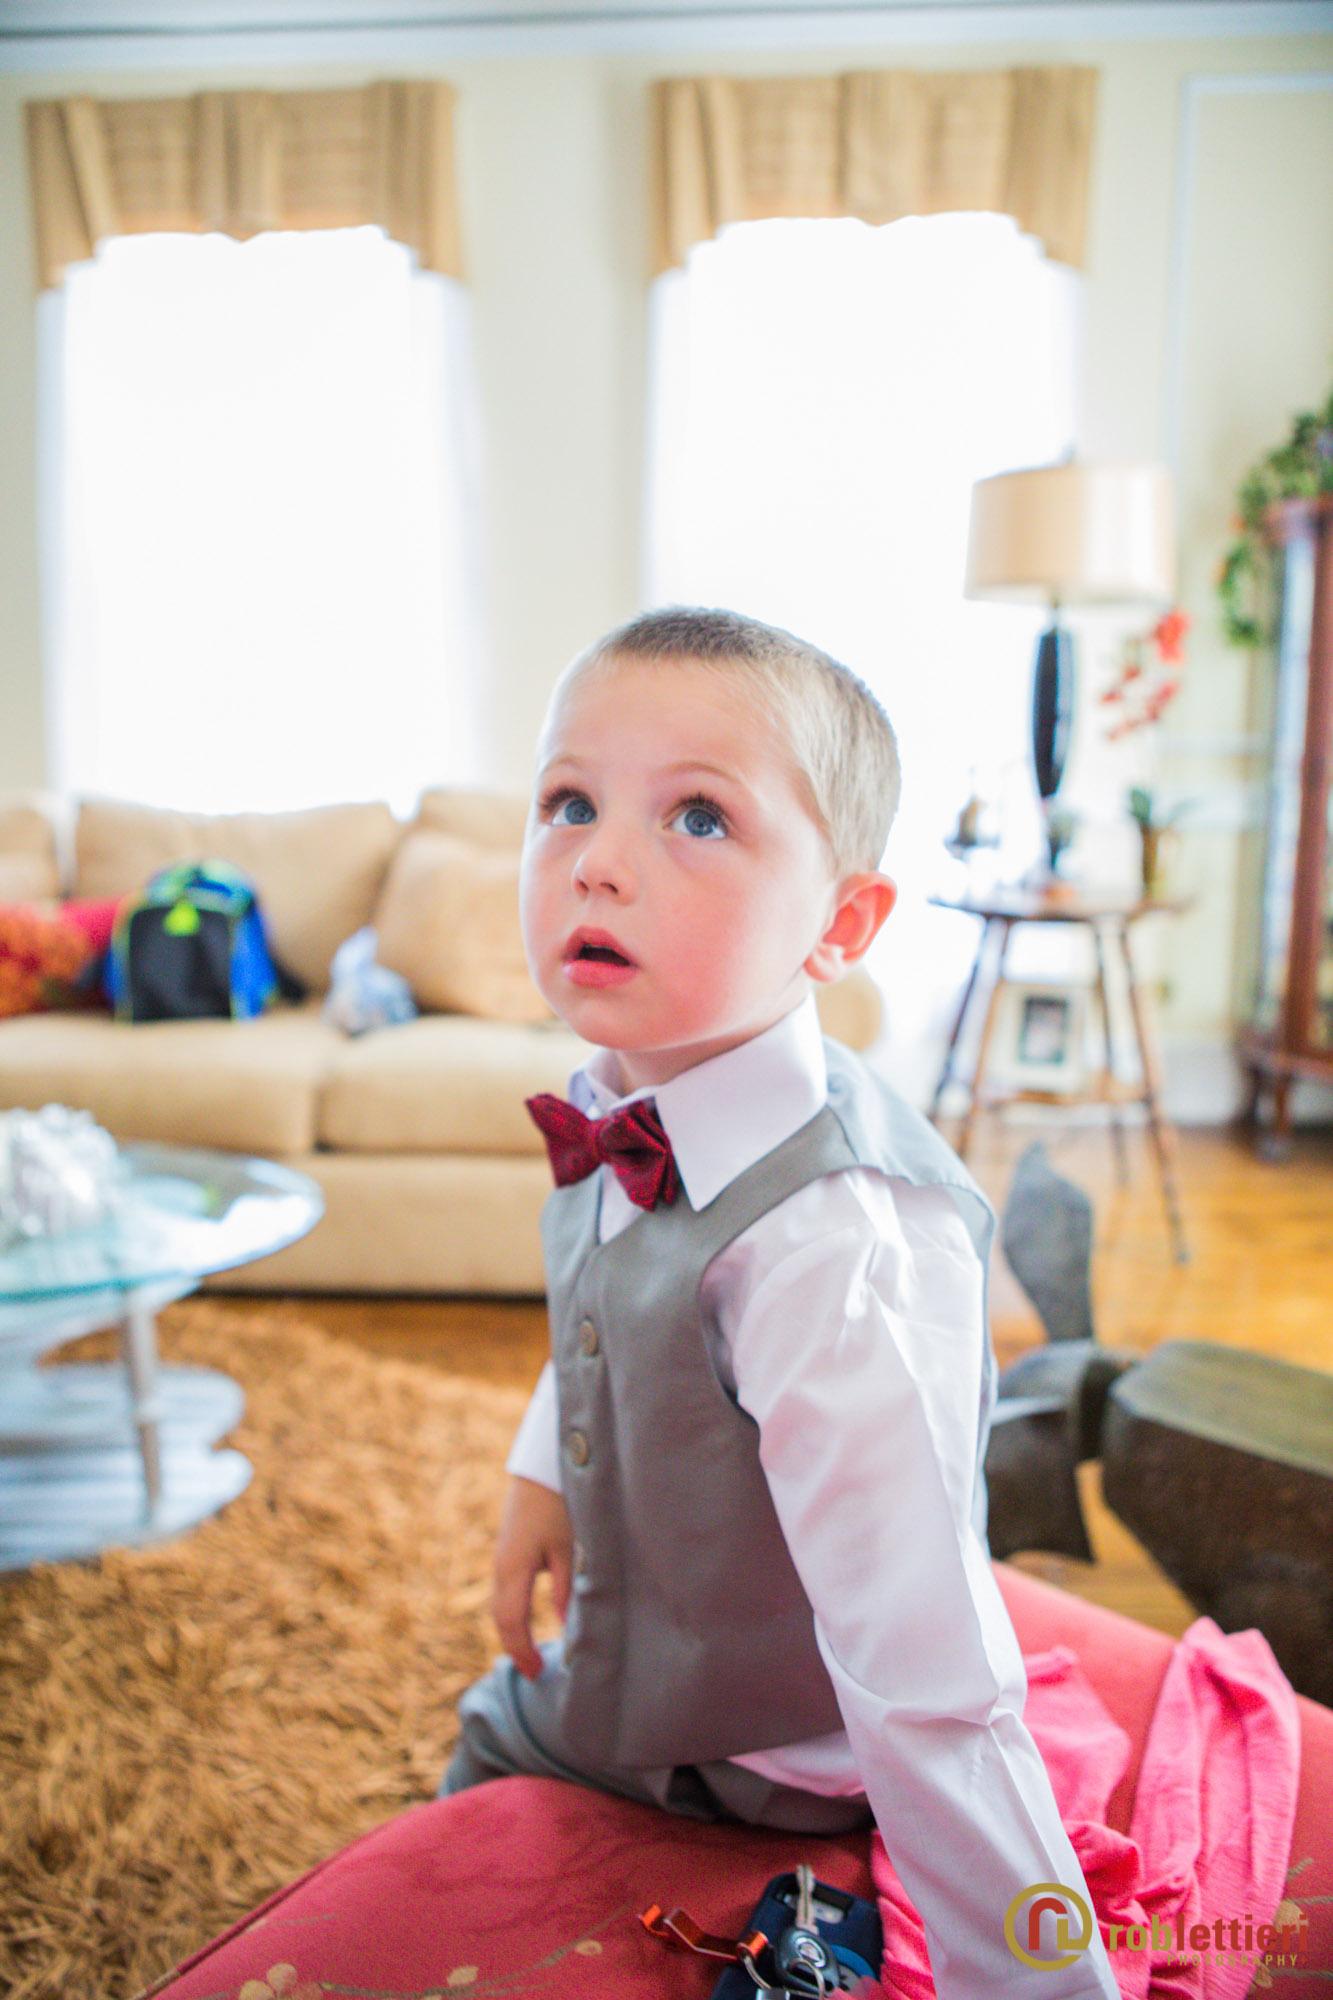 scranton_wedding_photographer_lettieri_pa-0139.jpg